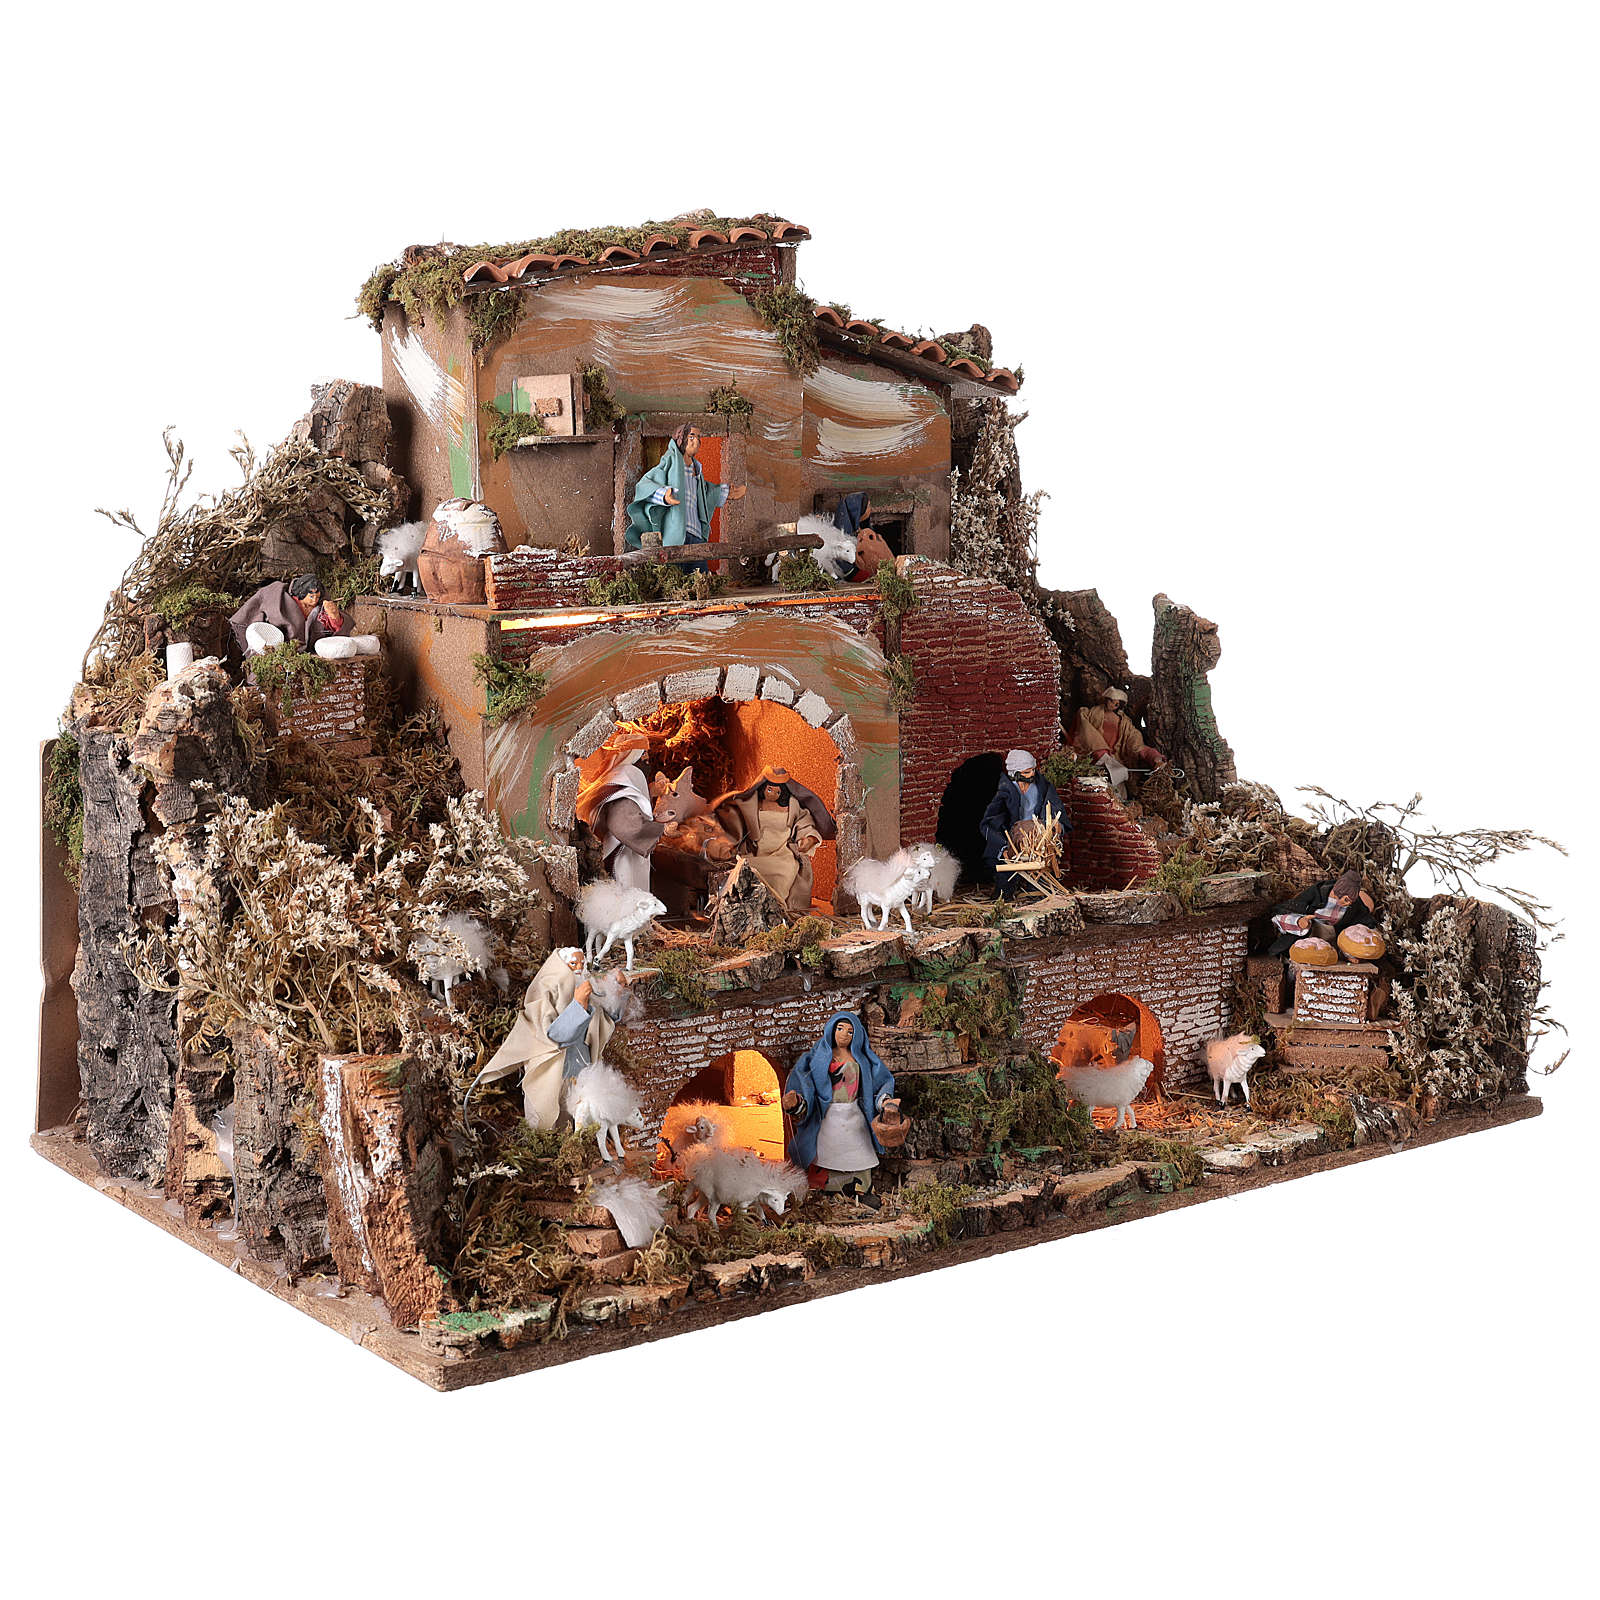 Illuminated nativity scene village with shepherds 12 cm- 5 movements 60x80x50 cm 4